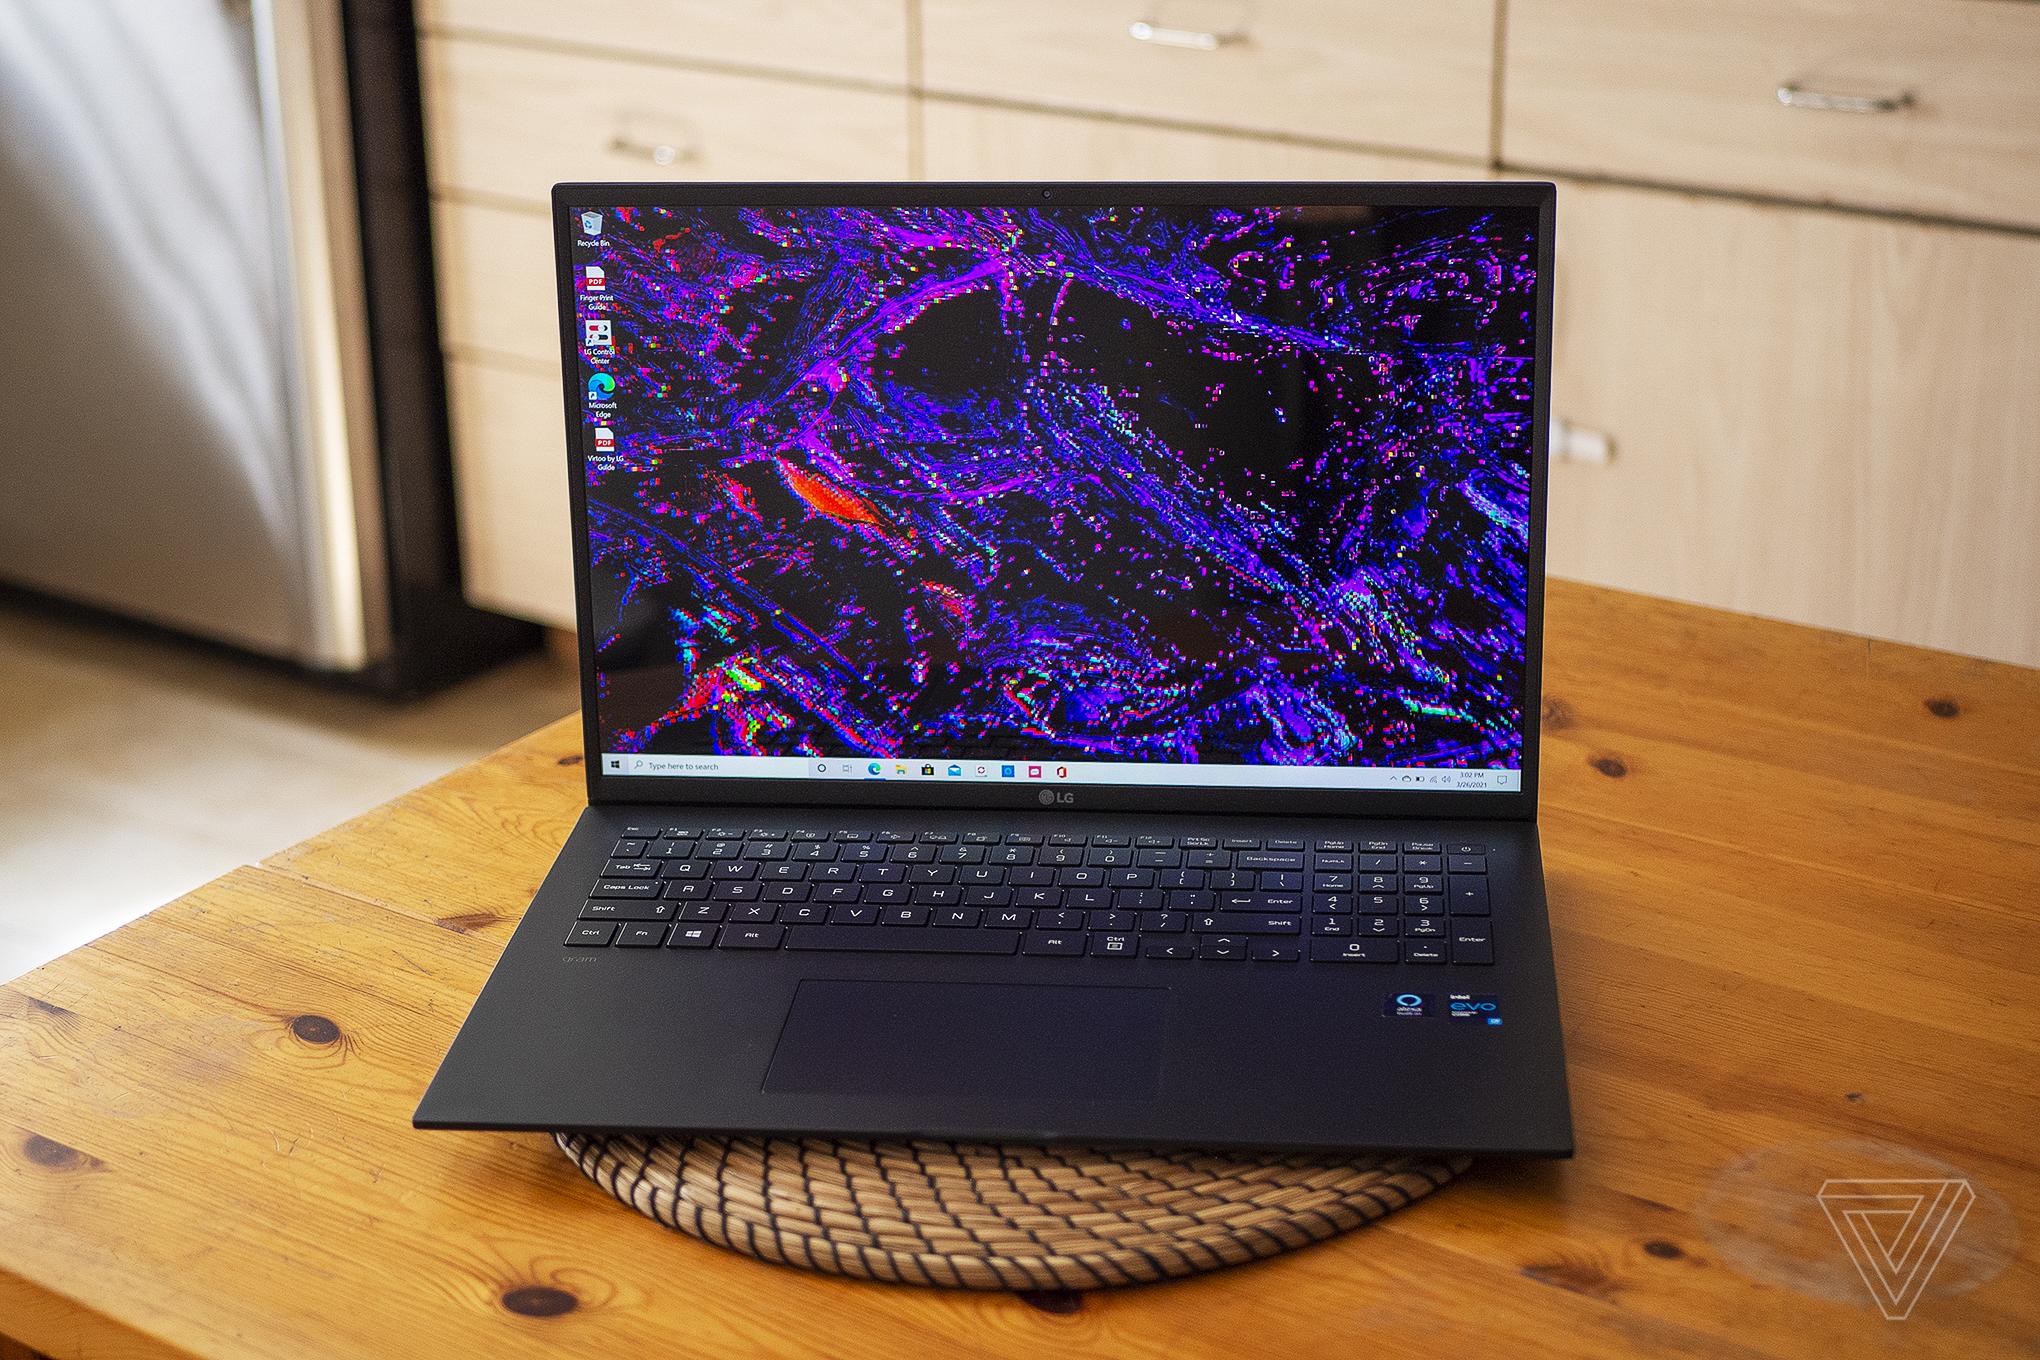 Best Laptop 20201: LG Gram 17